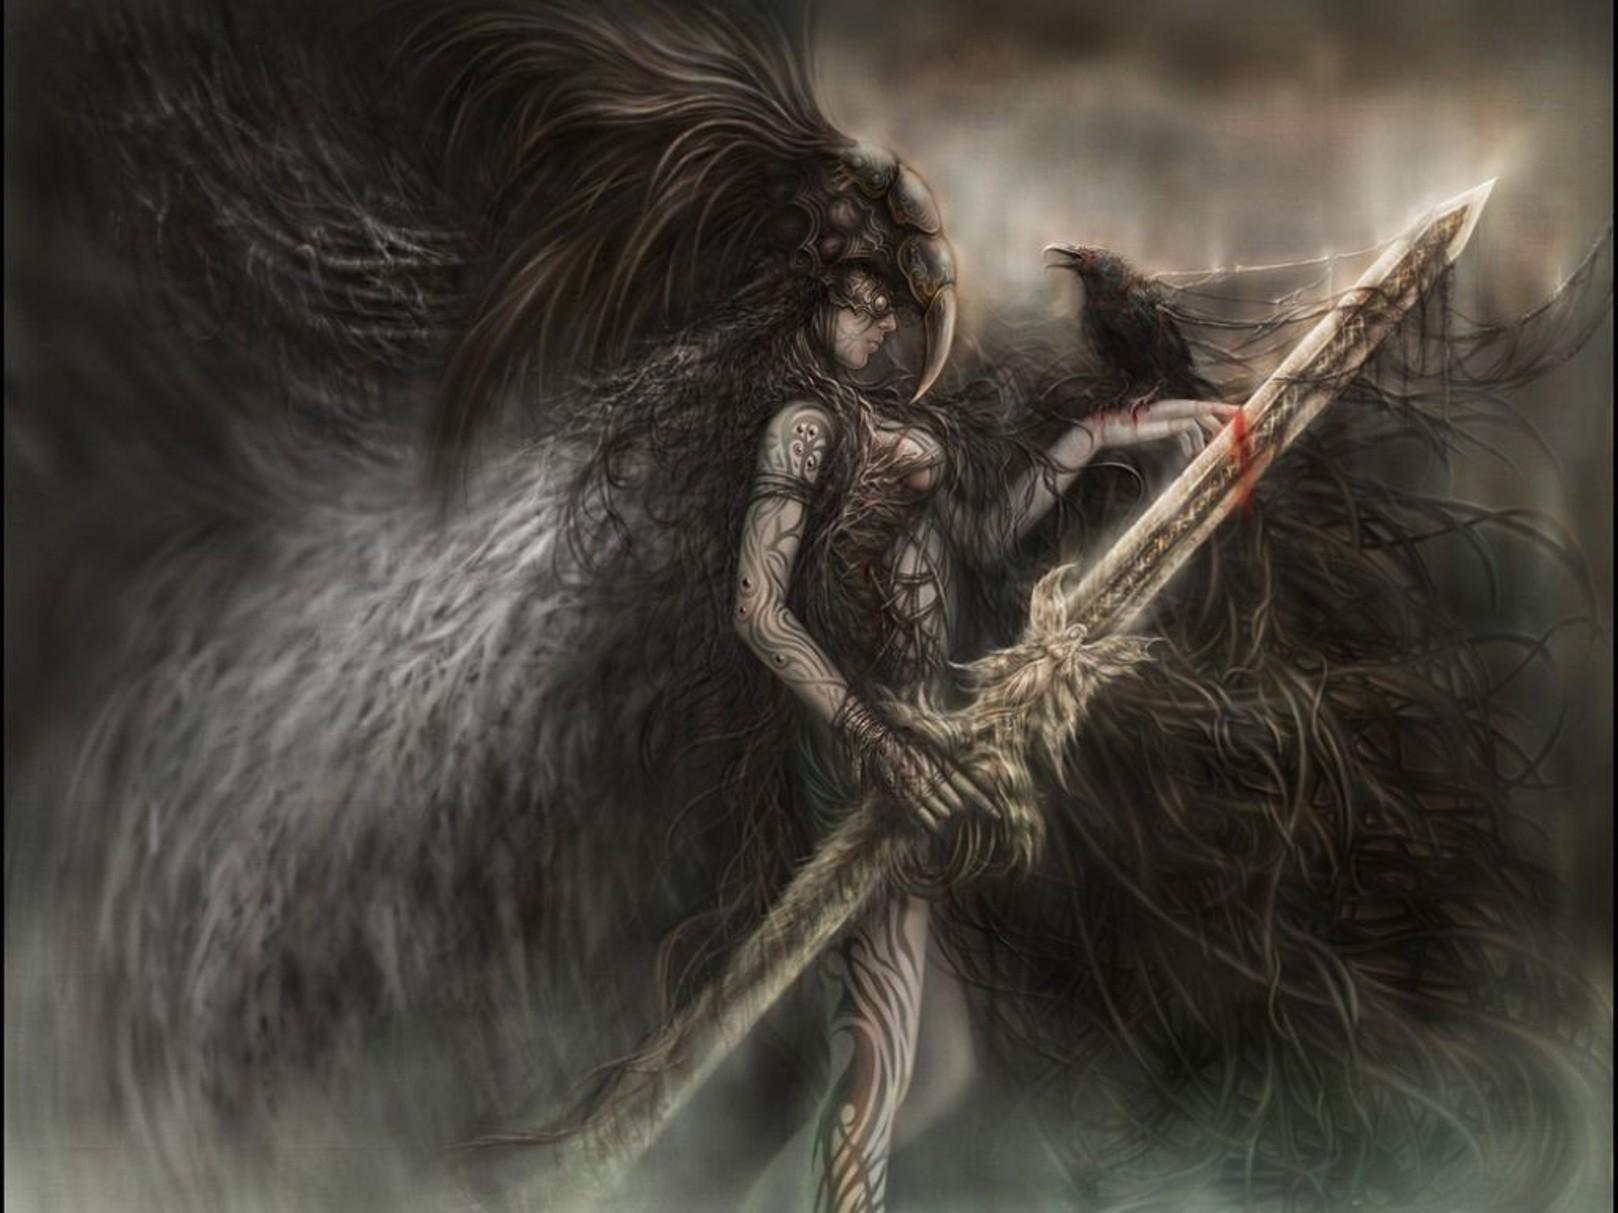 Фэнтези девушка с мечом